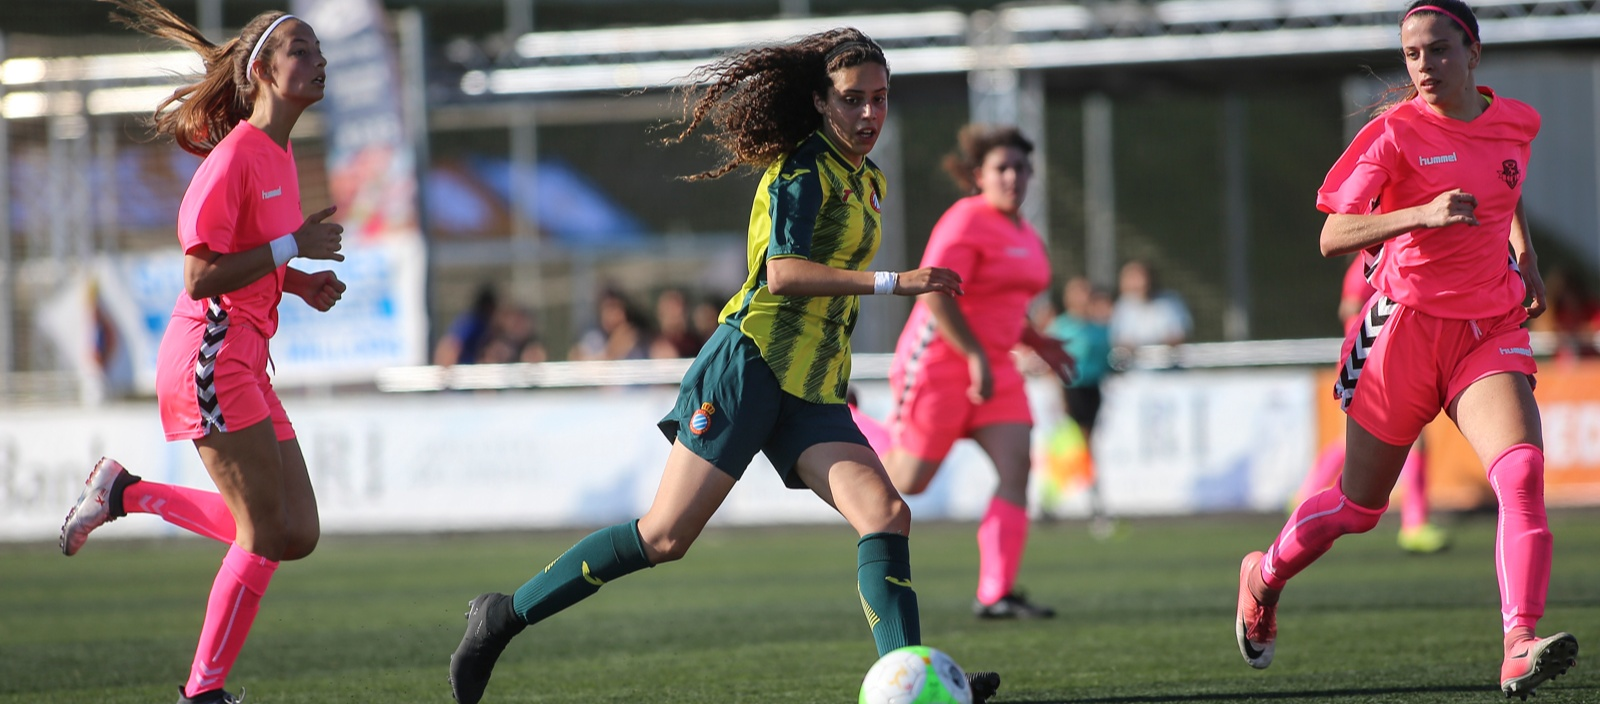 El RCD Espanyol Femení 'B' s'enfrontarà al CD Monte per ascendir a Reto Iberdrola